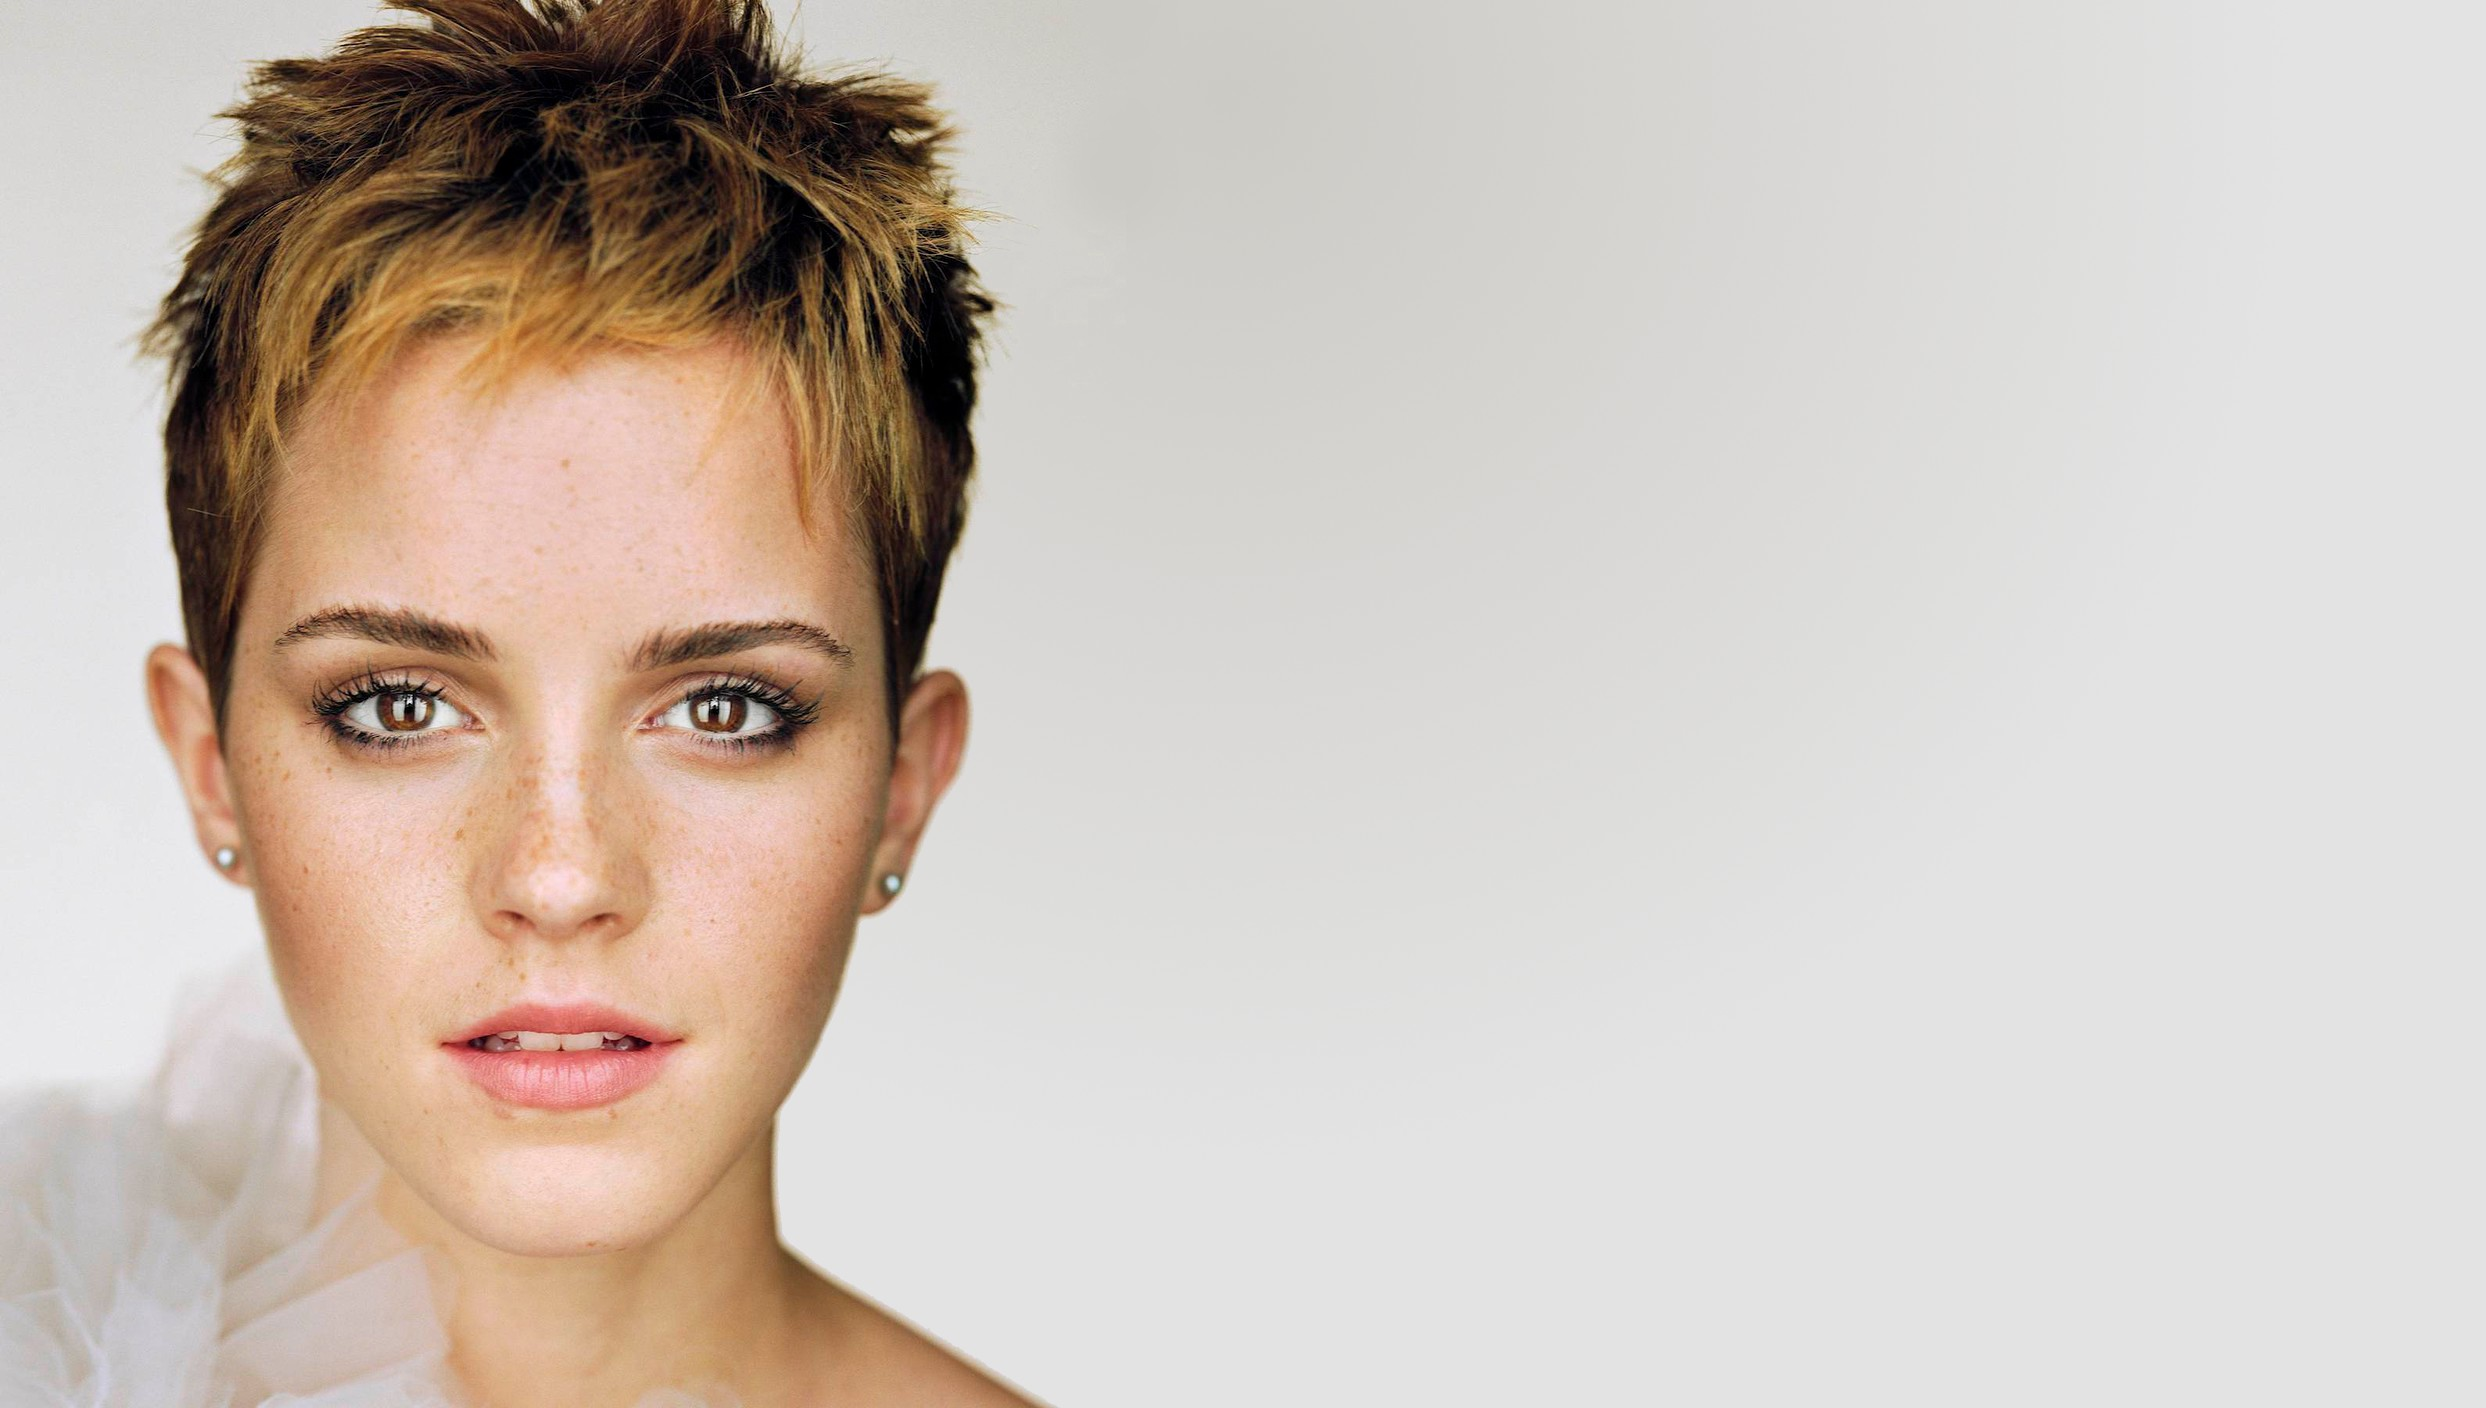 Emma Watson 21, HD Celebrities, 4k Wallpapers, Images